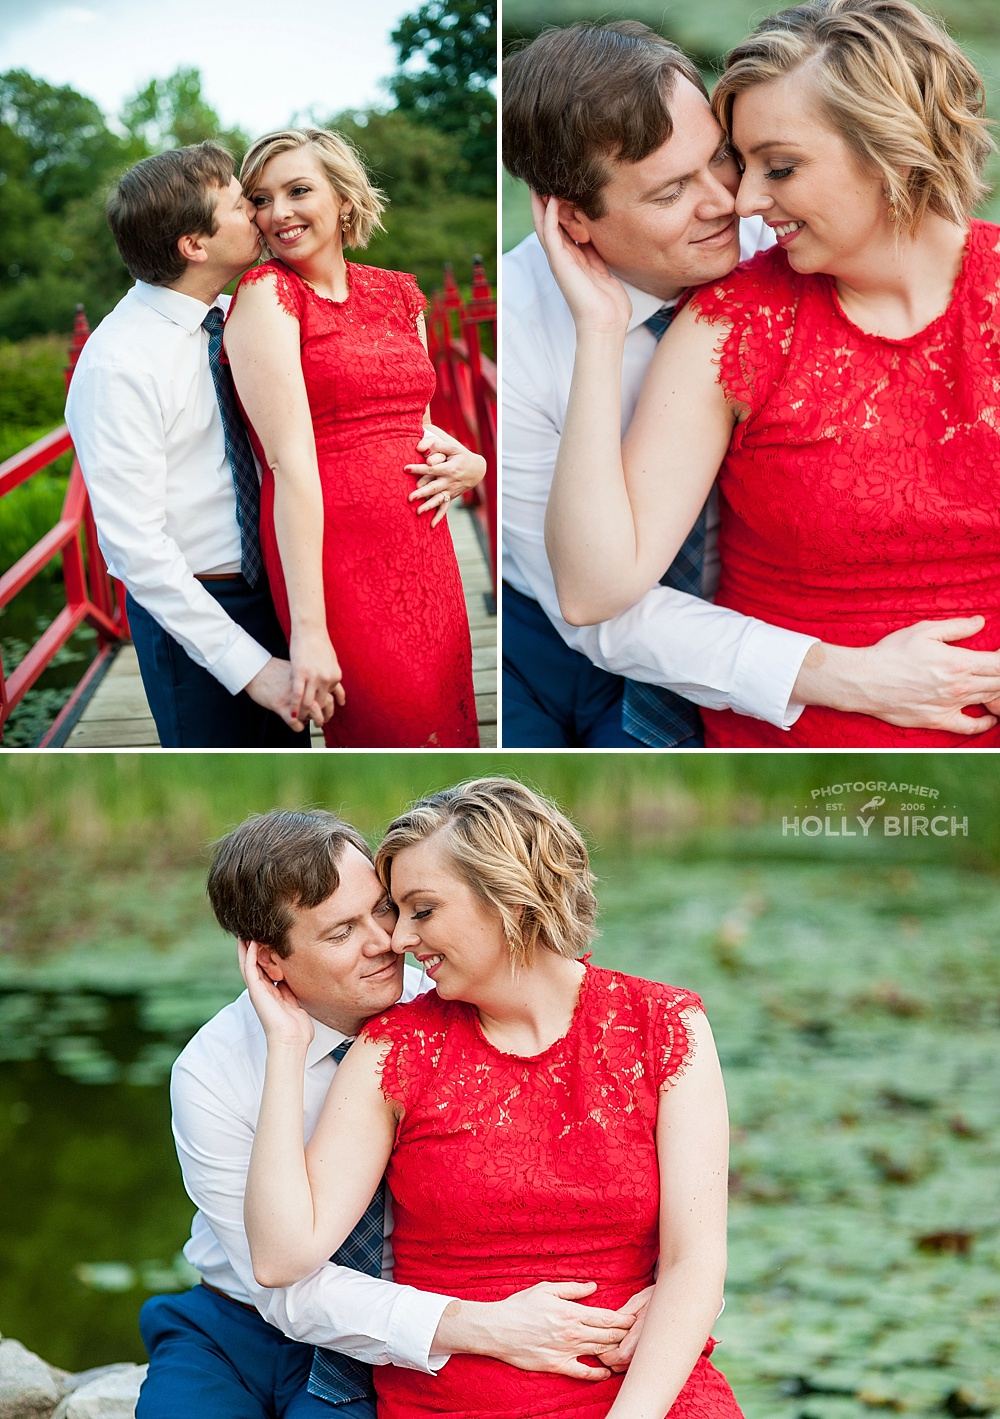 romantic engagement photo session